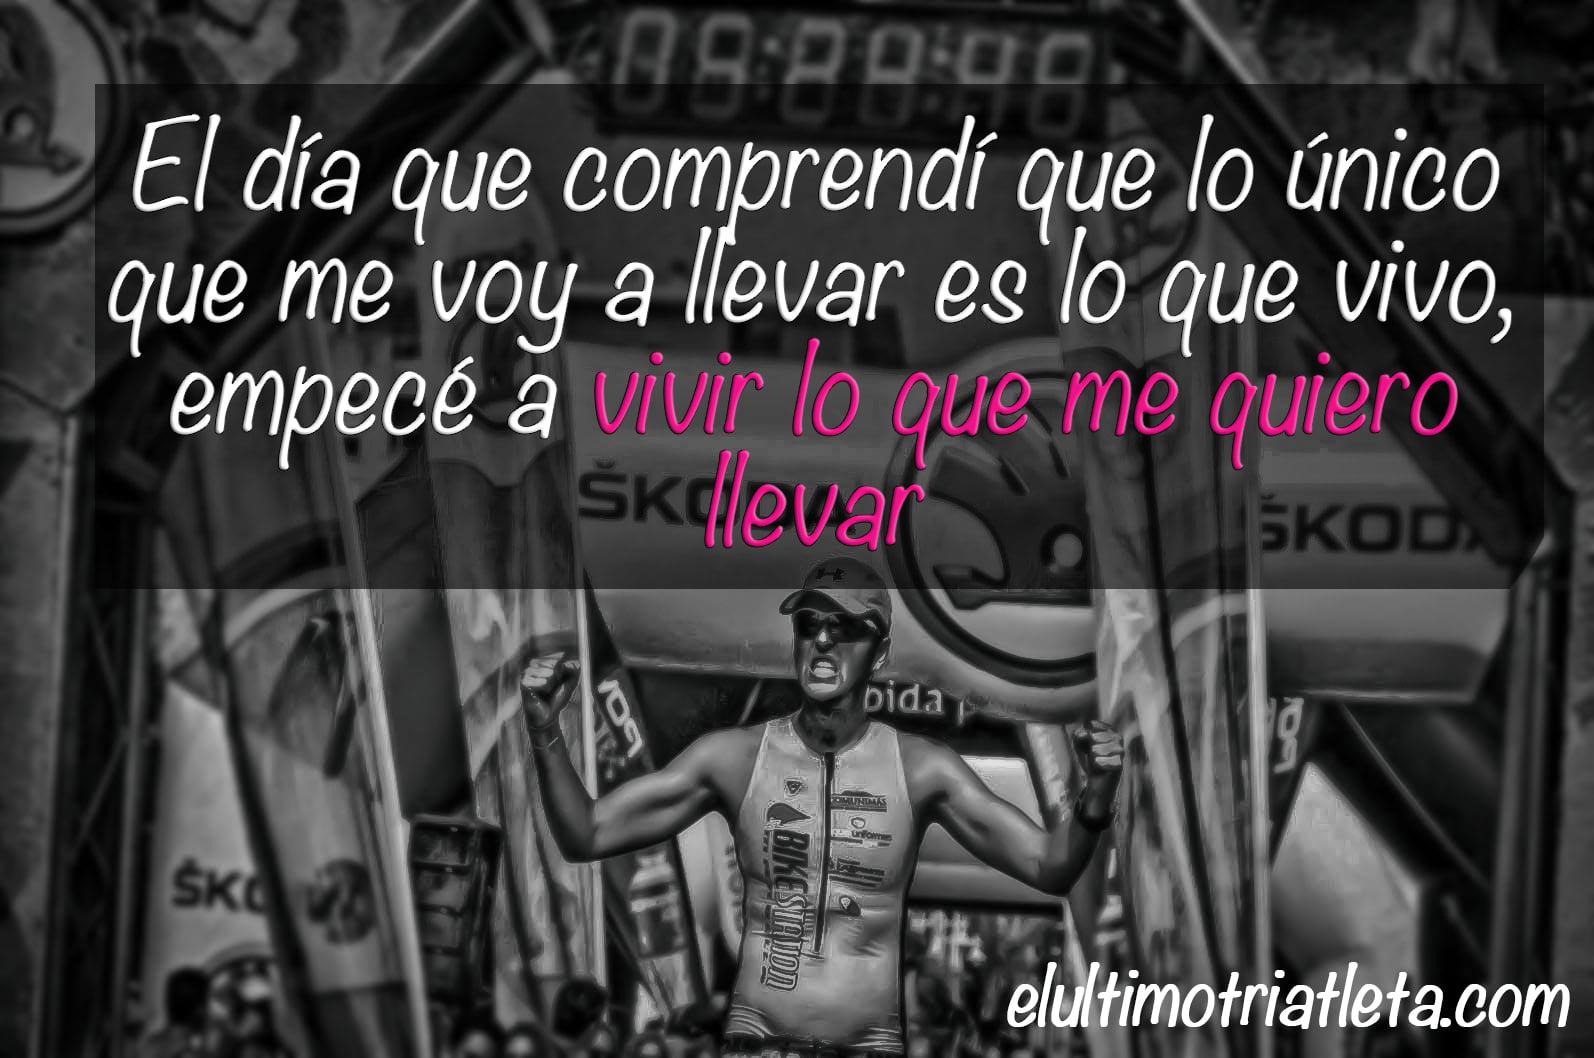 Motivacion deporte 1